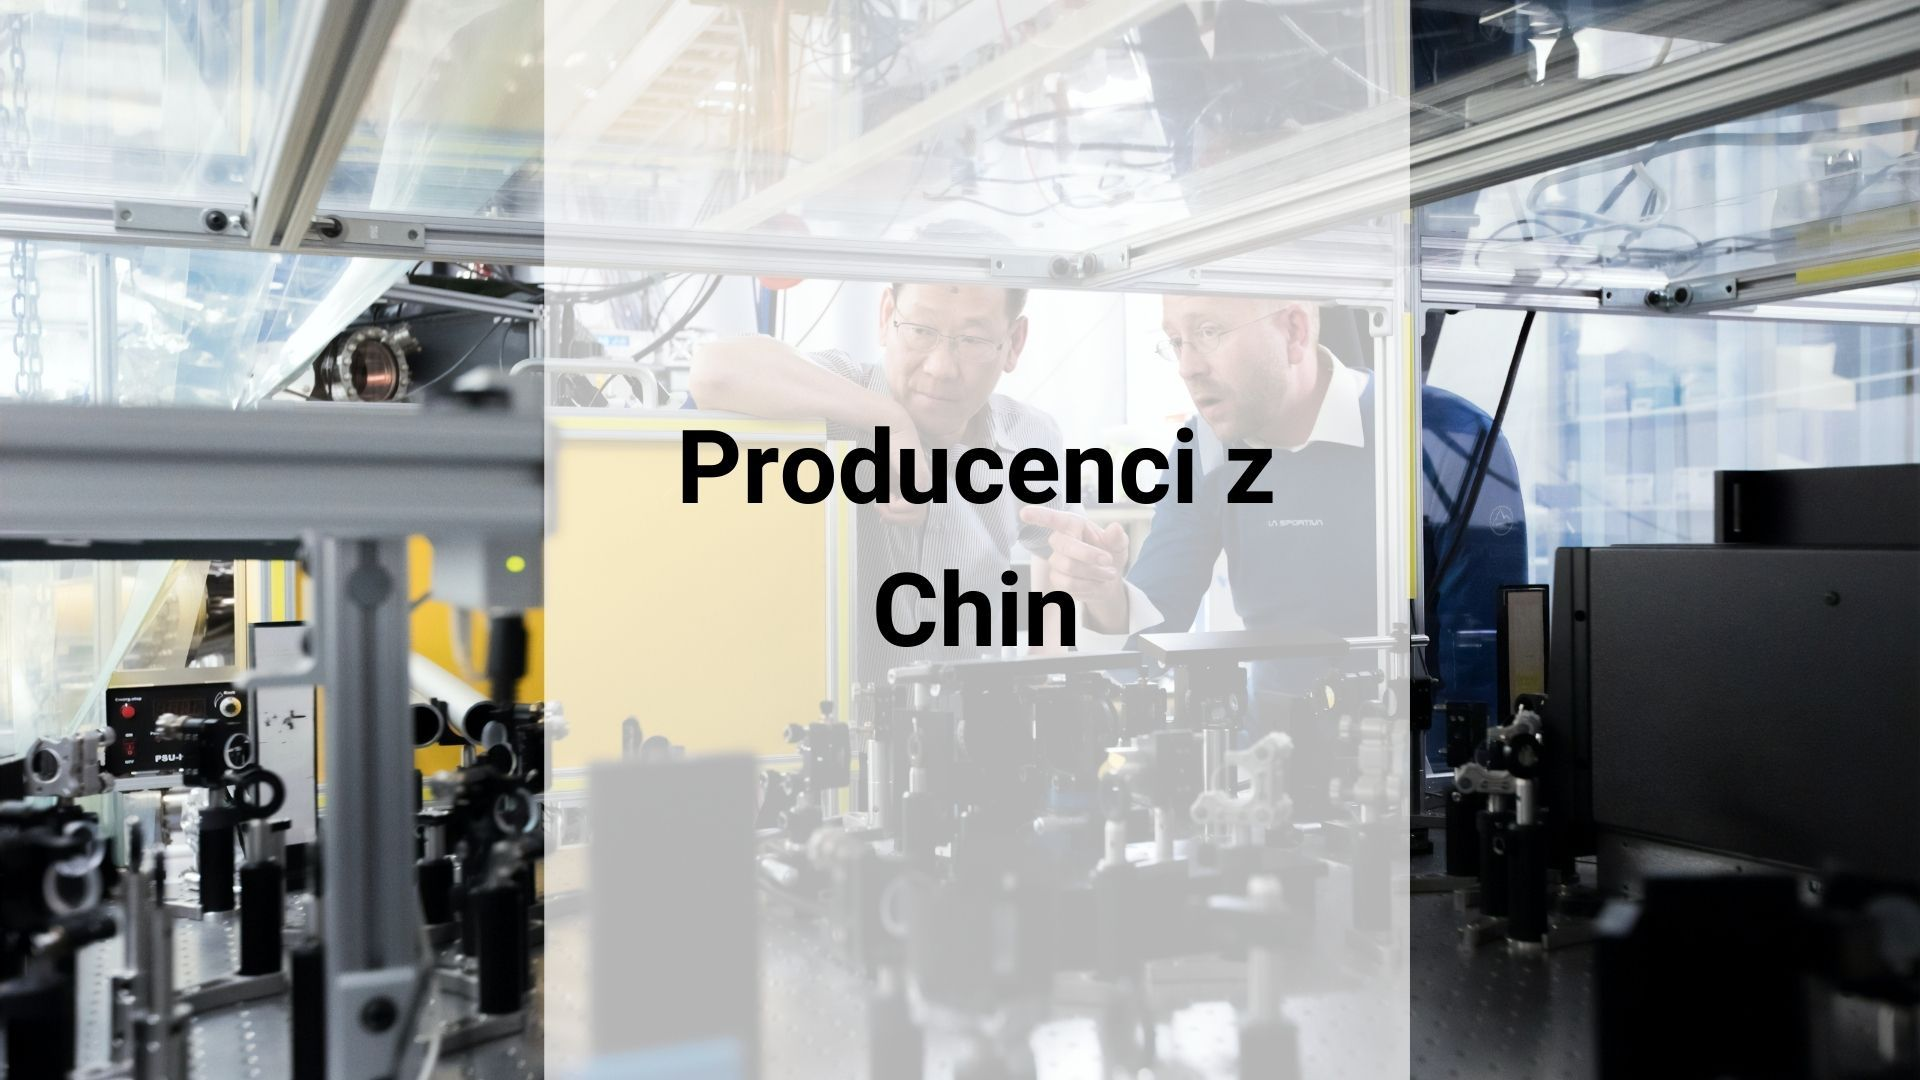 Producenci z Chin